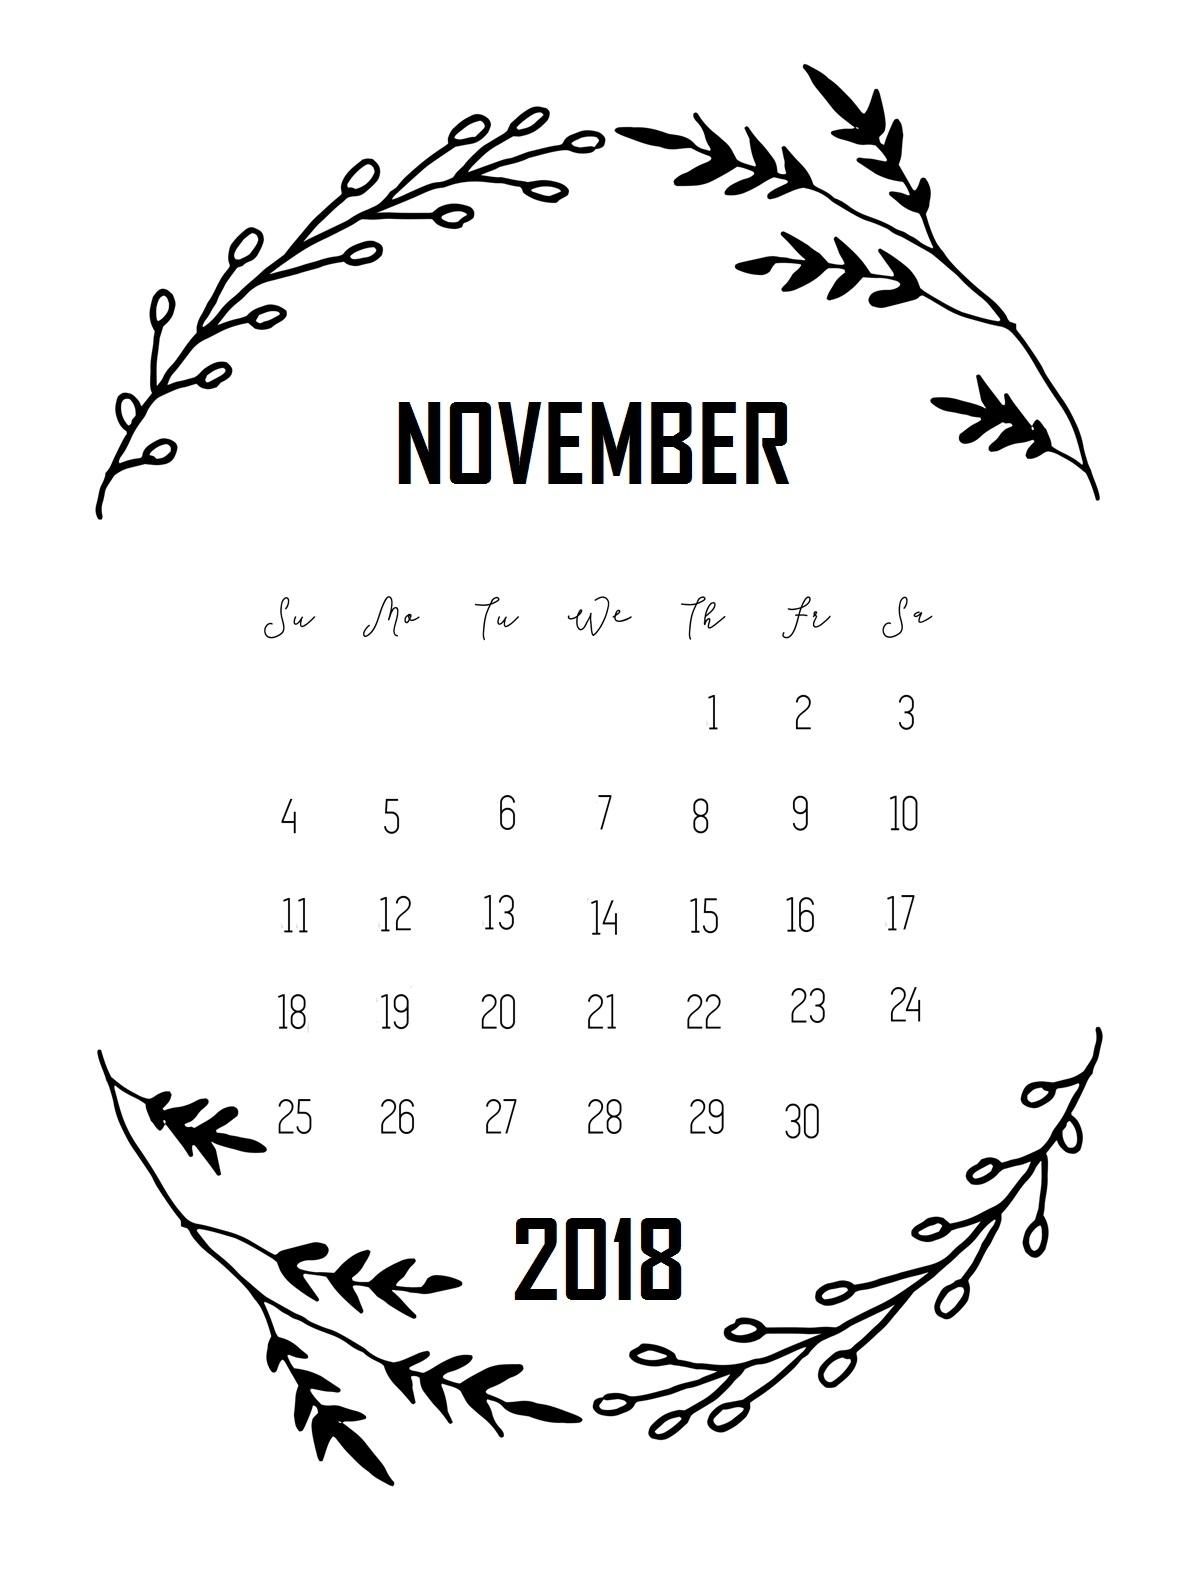 free november 2018 calendar printable::November 2018 Calendar Printable